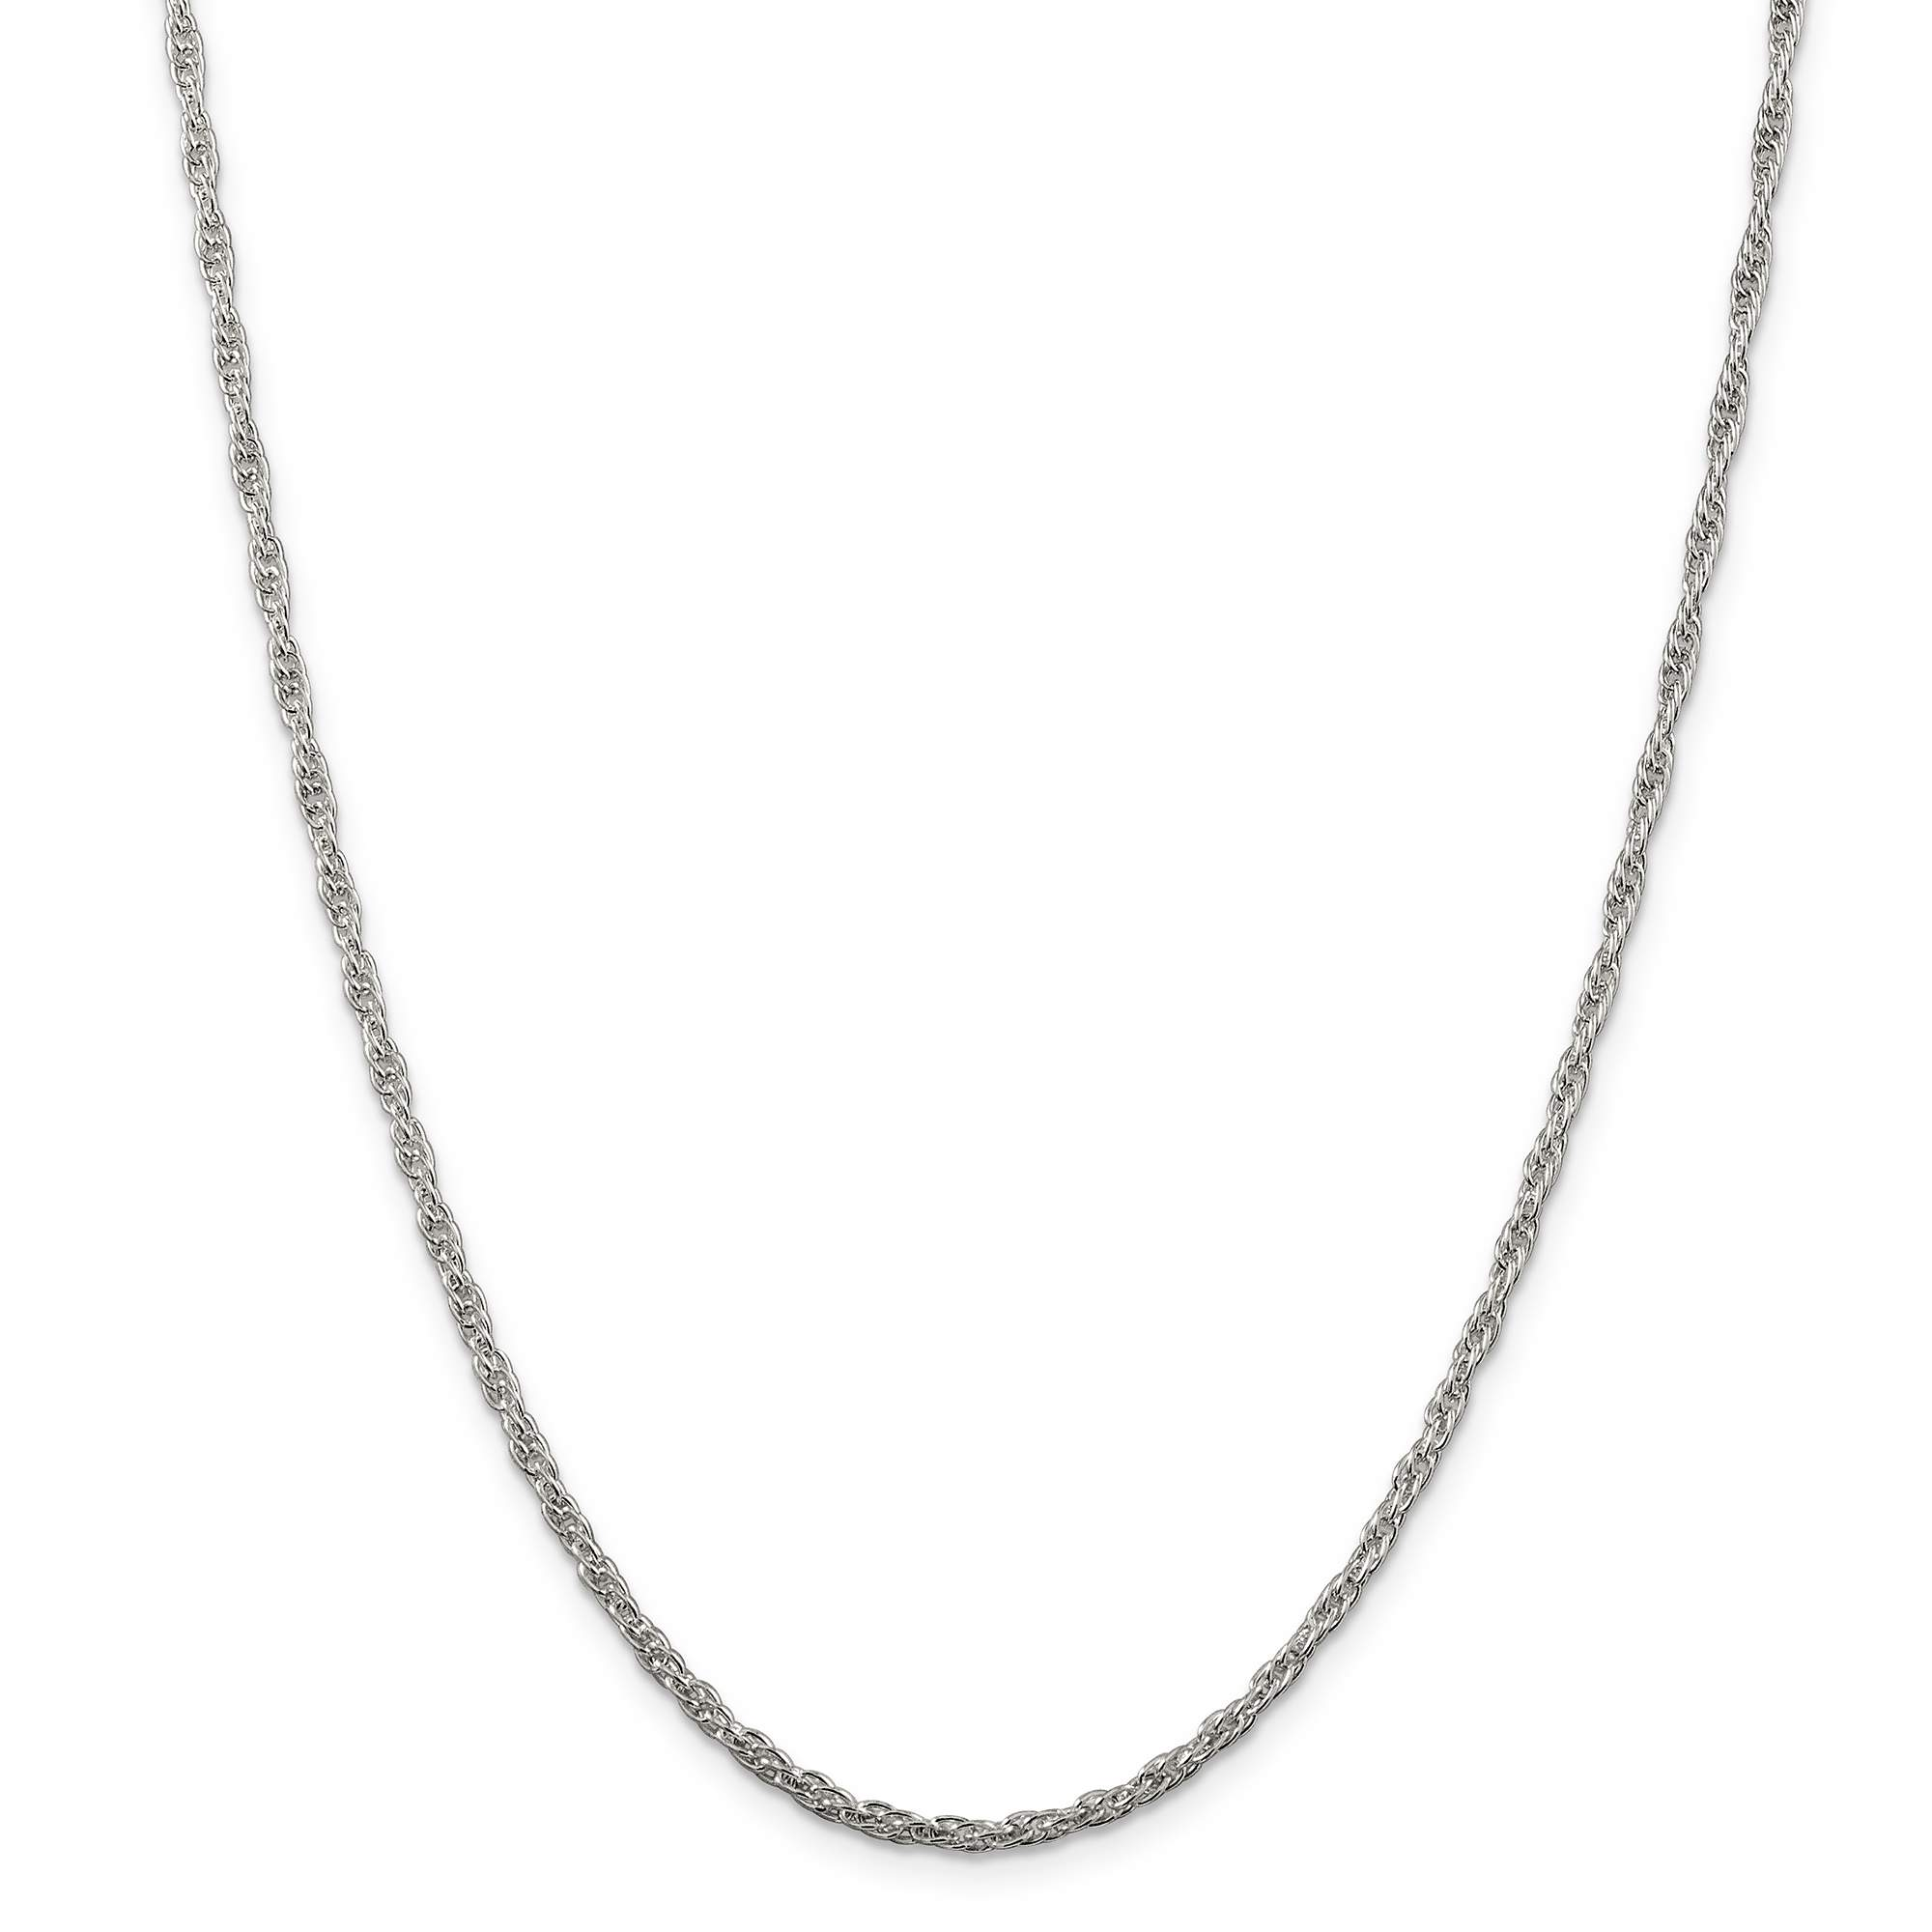 DiamondJewelryNY 14kt Gold Filled O//L of Perpetual Help Pendant